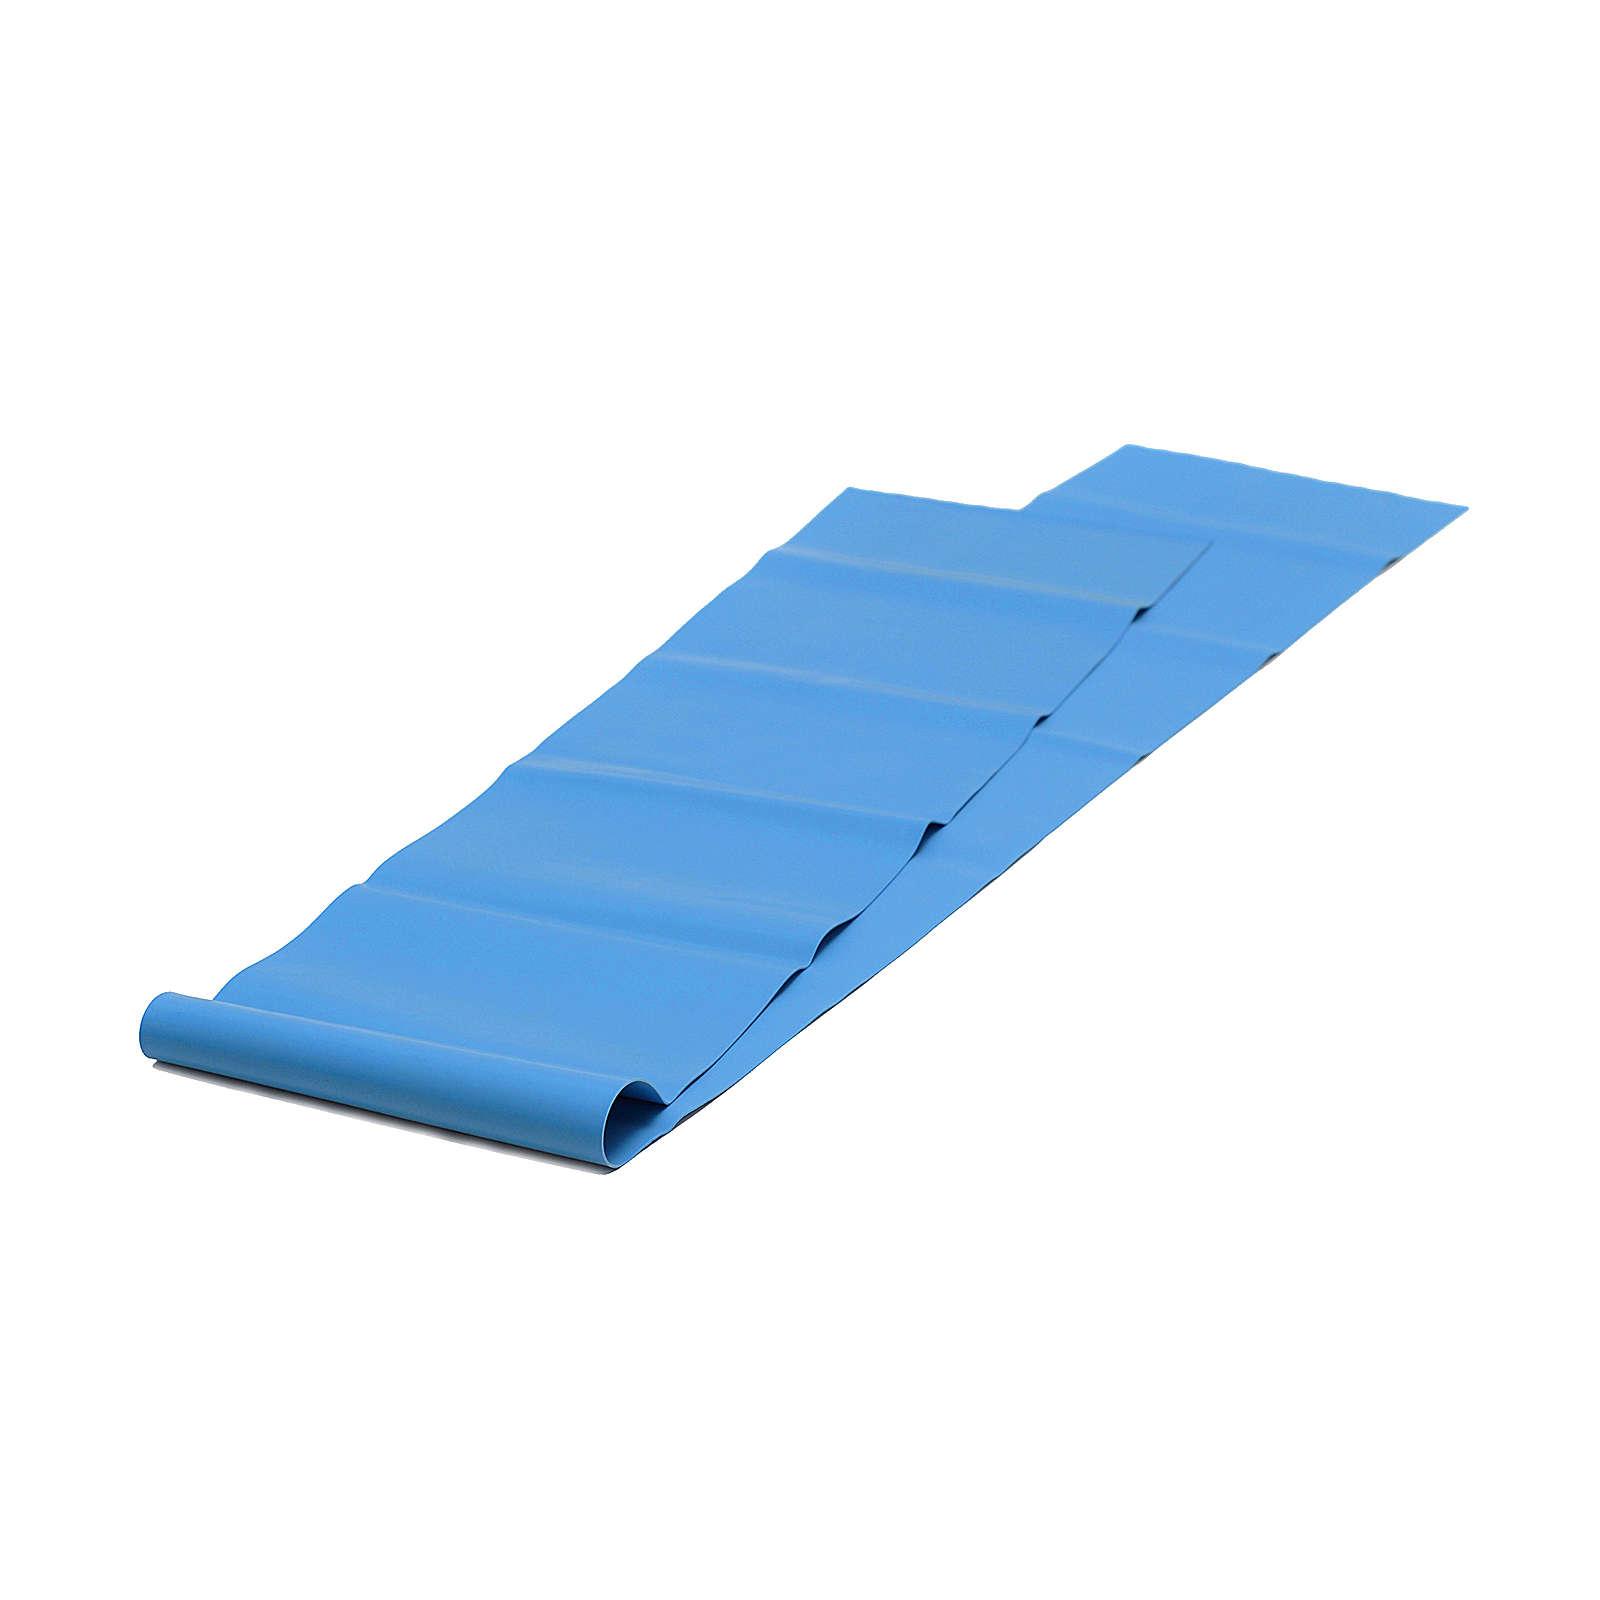 Yogistar Pilates Stretchband - latexfrei Fitnesszubehör blau